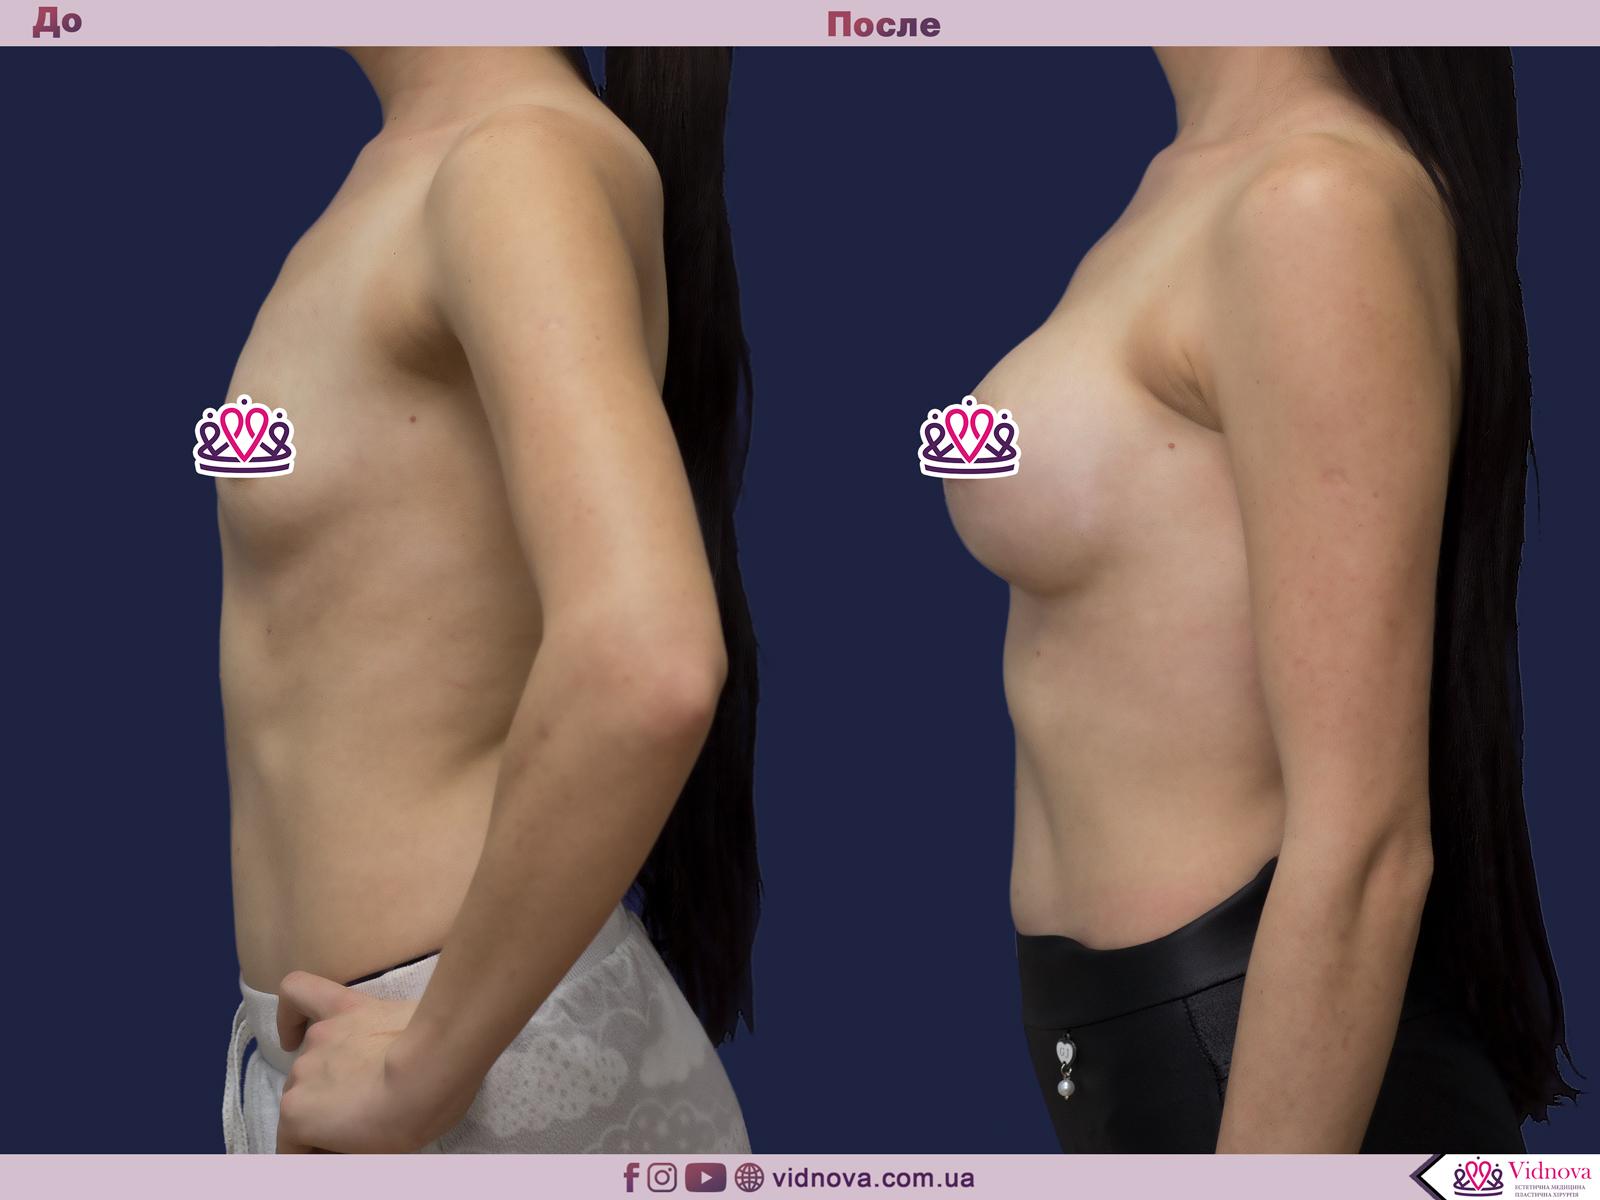 Увеличение груди: Фото ДО и ПОСЛЕ - Пример №73-3 - Клиника Vidnova